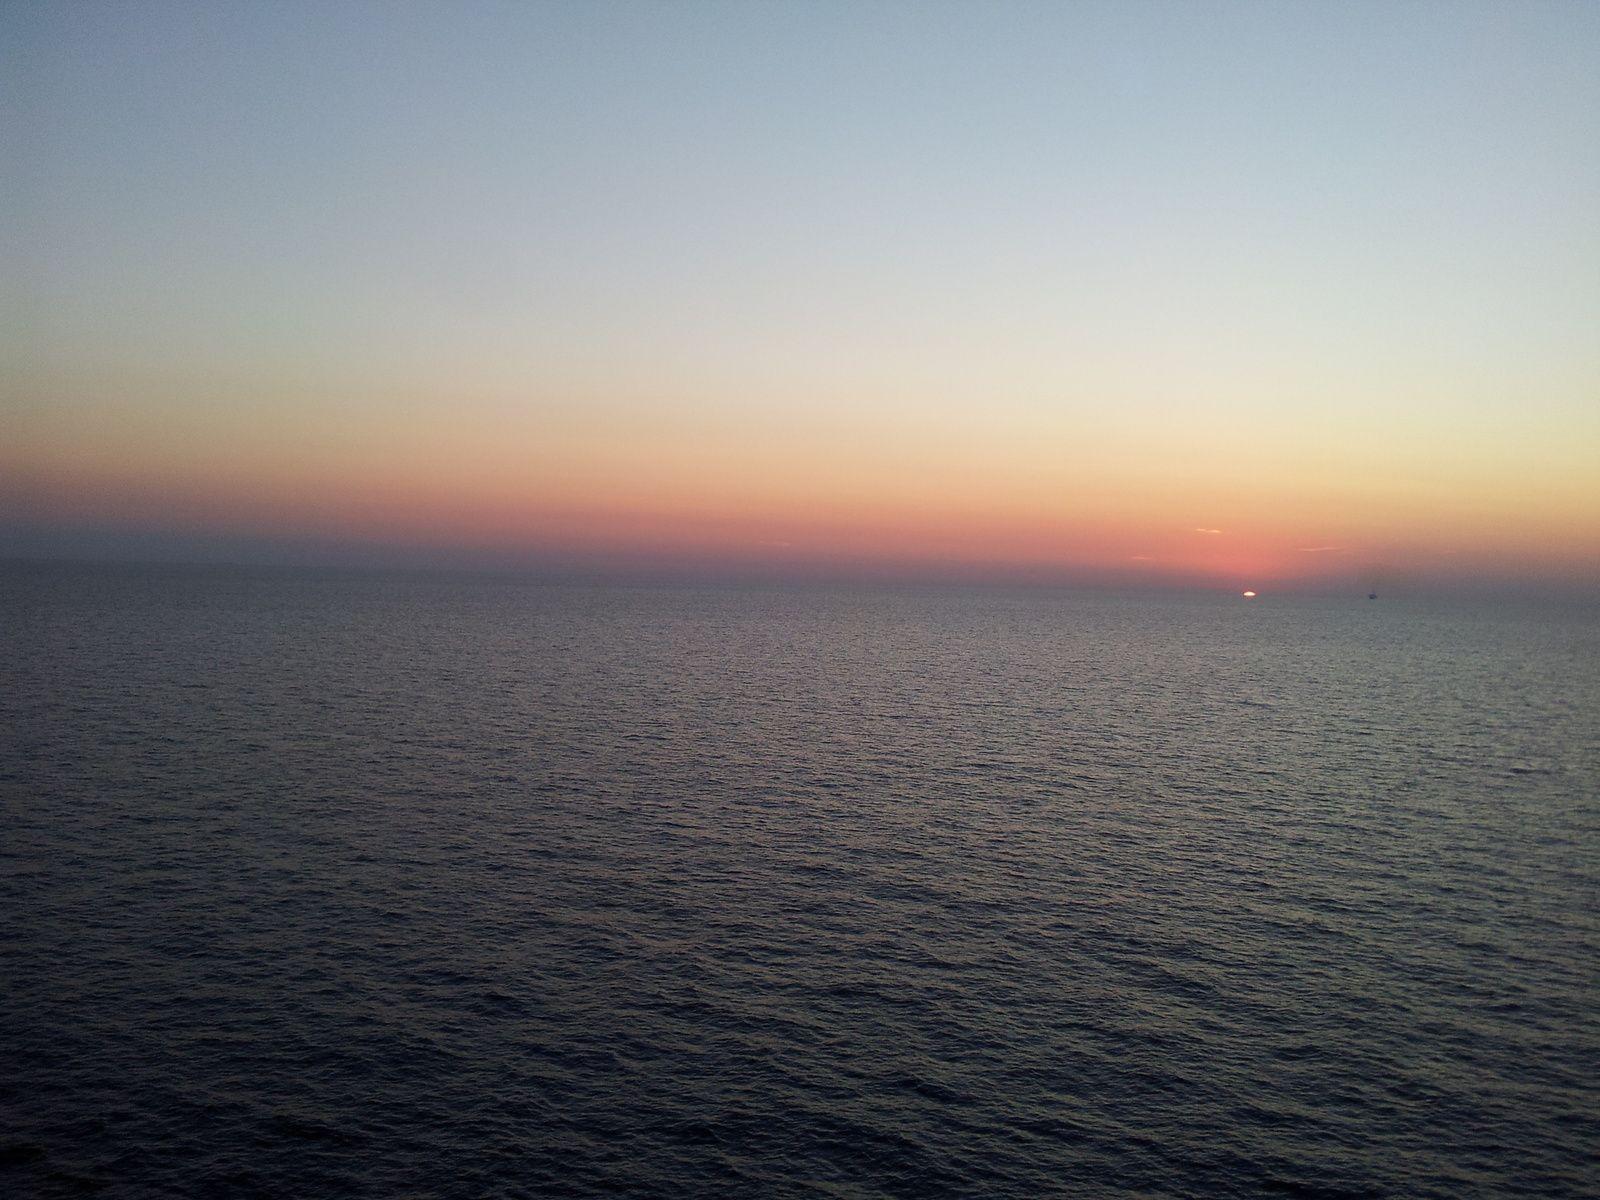 Mer Méditerranée, Corse. Août 2013.